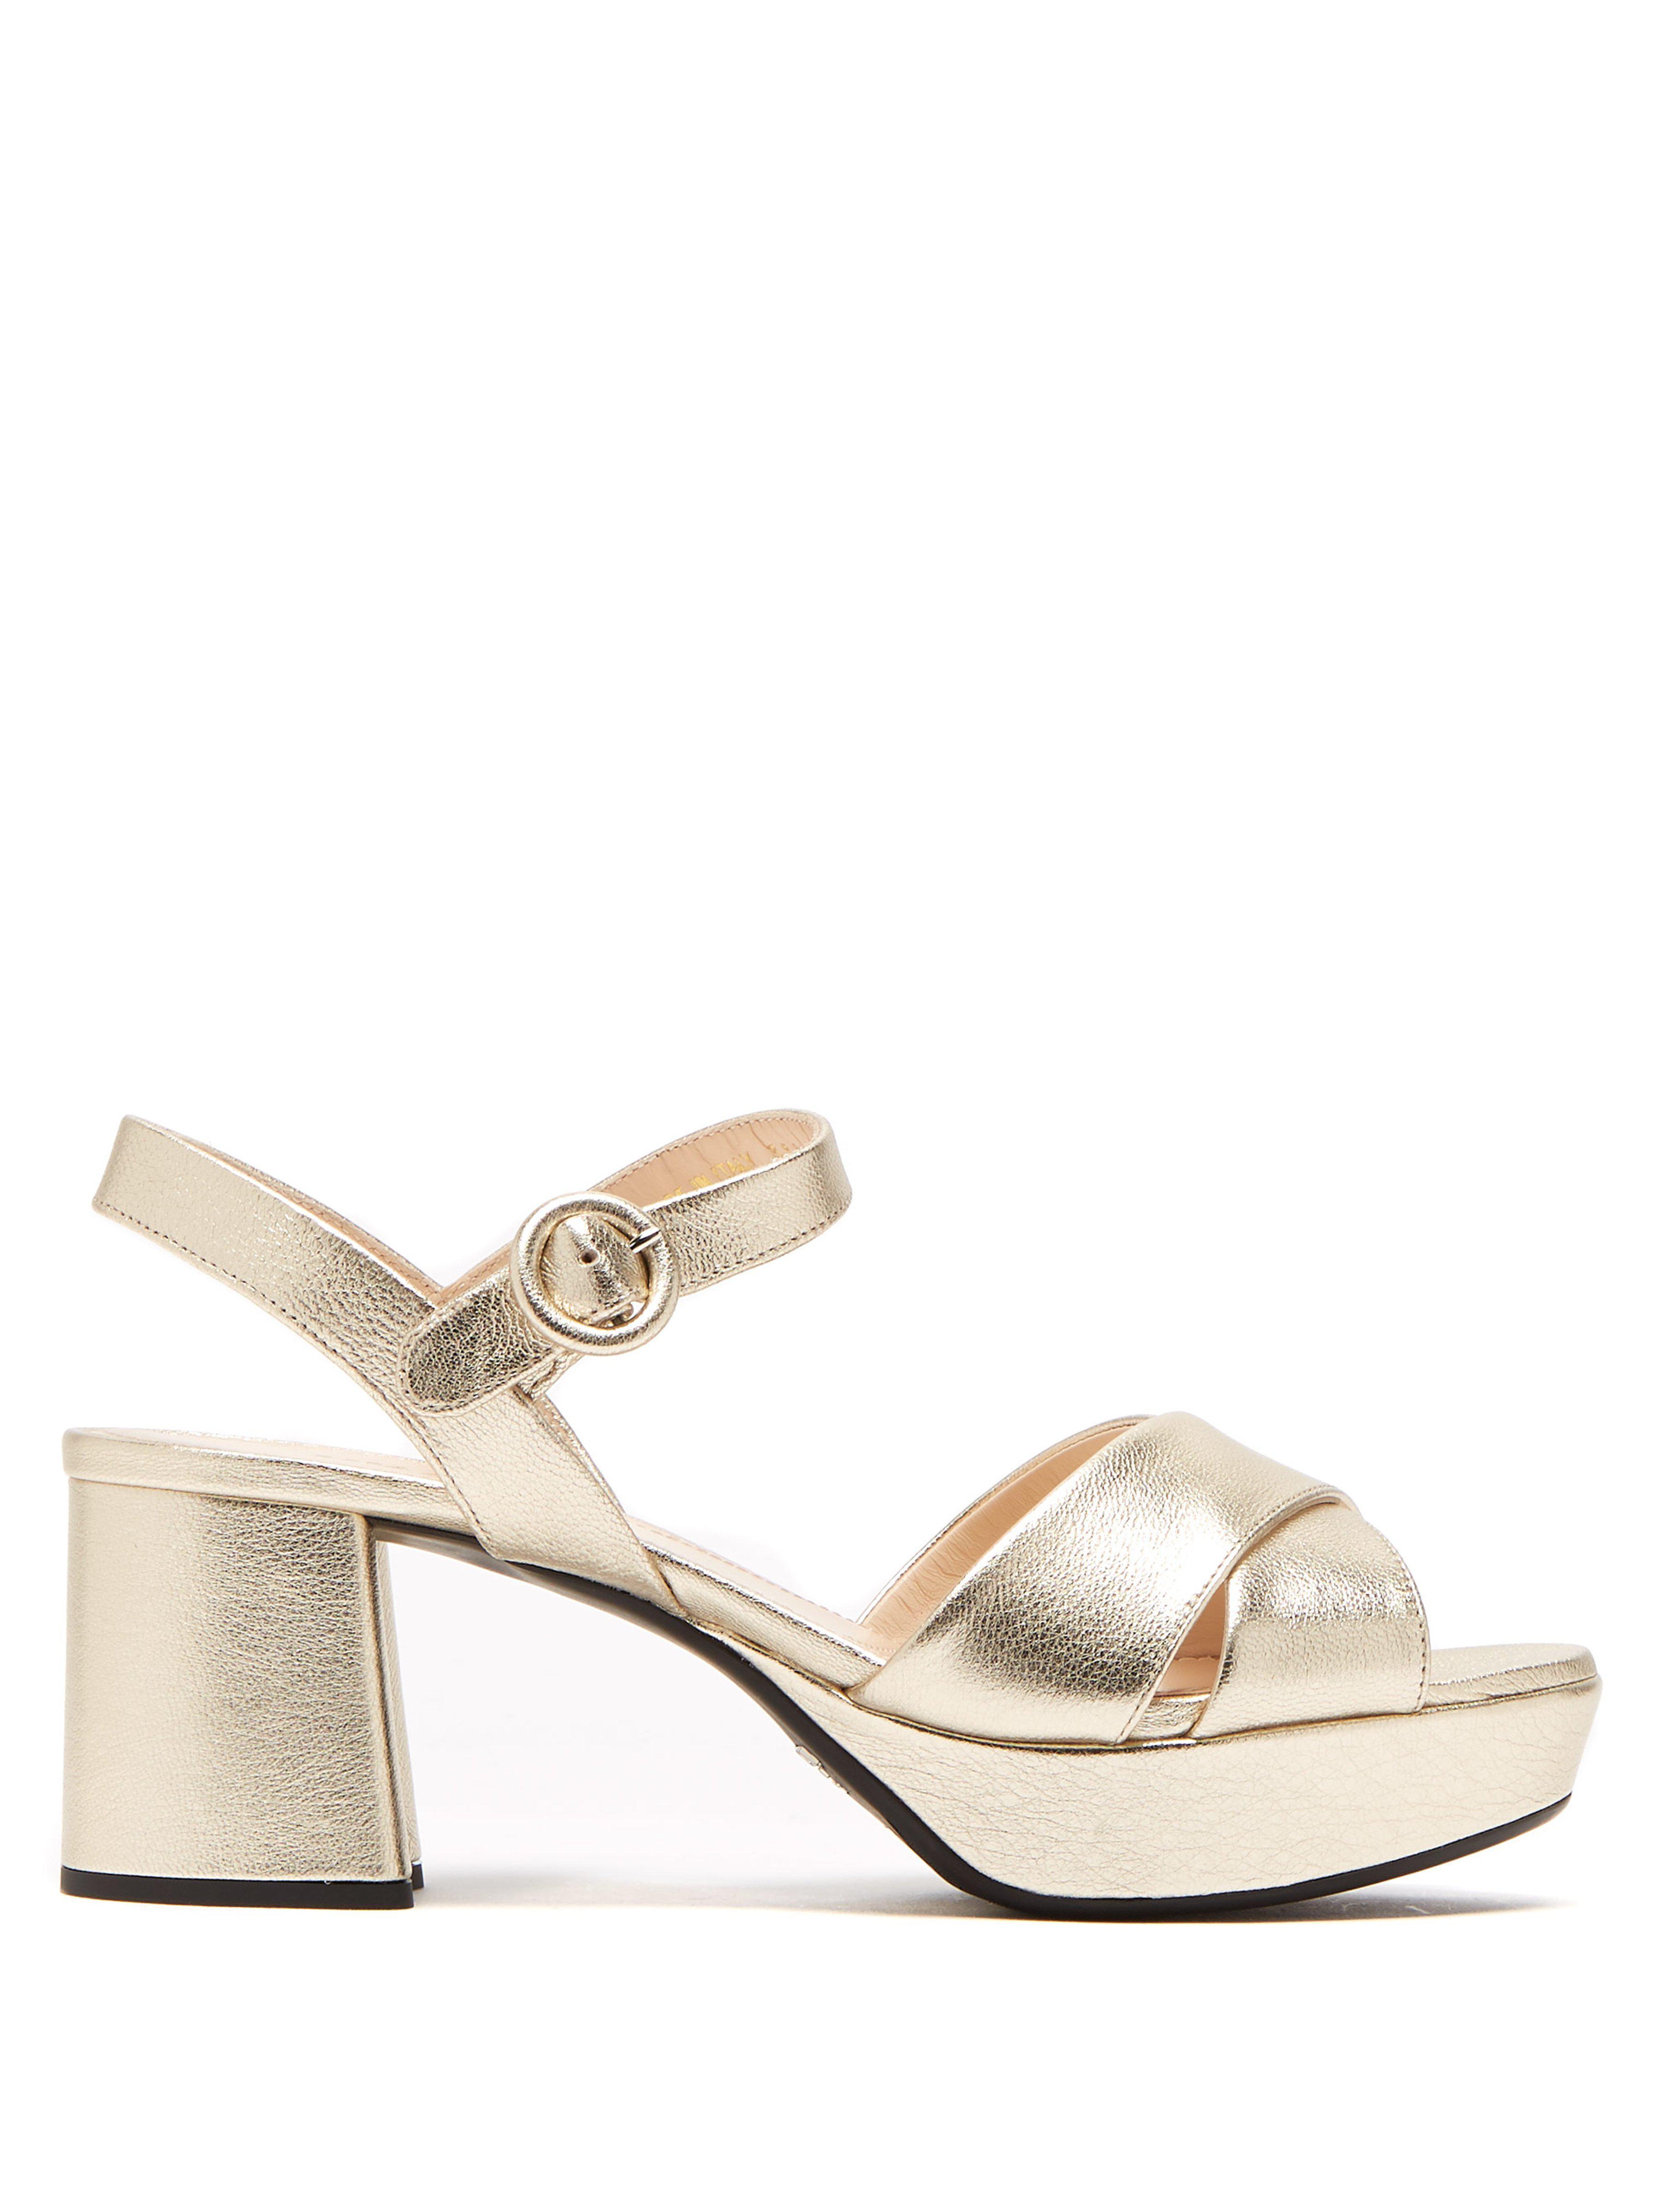 0e792703cd1 Prada Metallic Crisscross Platform Sandals in Metallic - Save ...